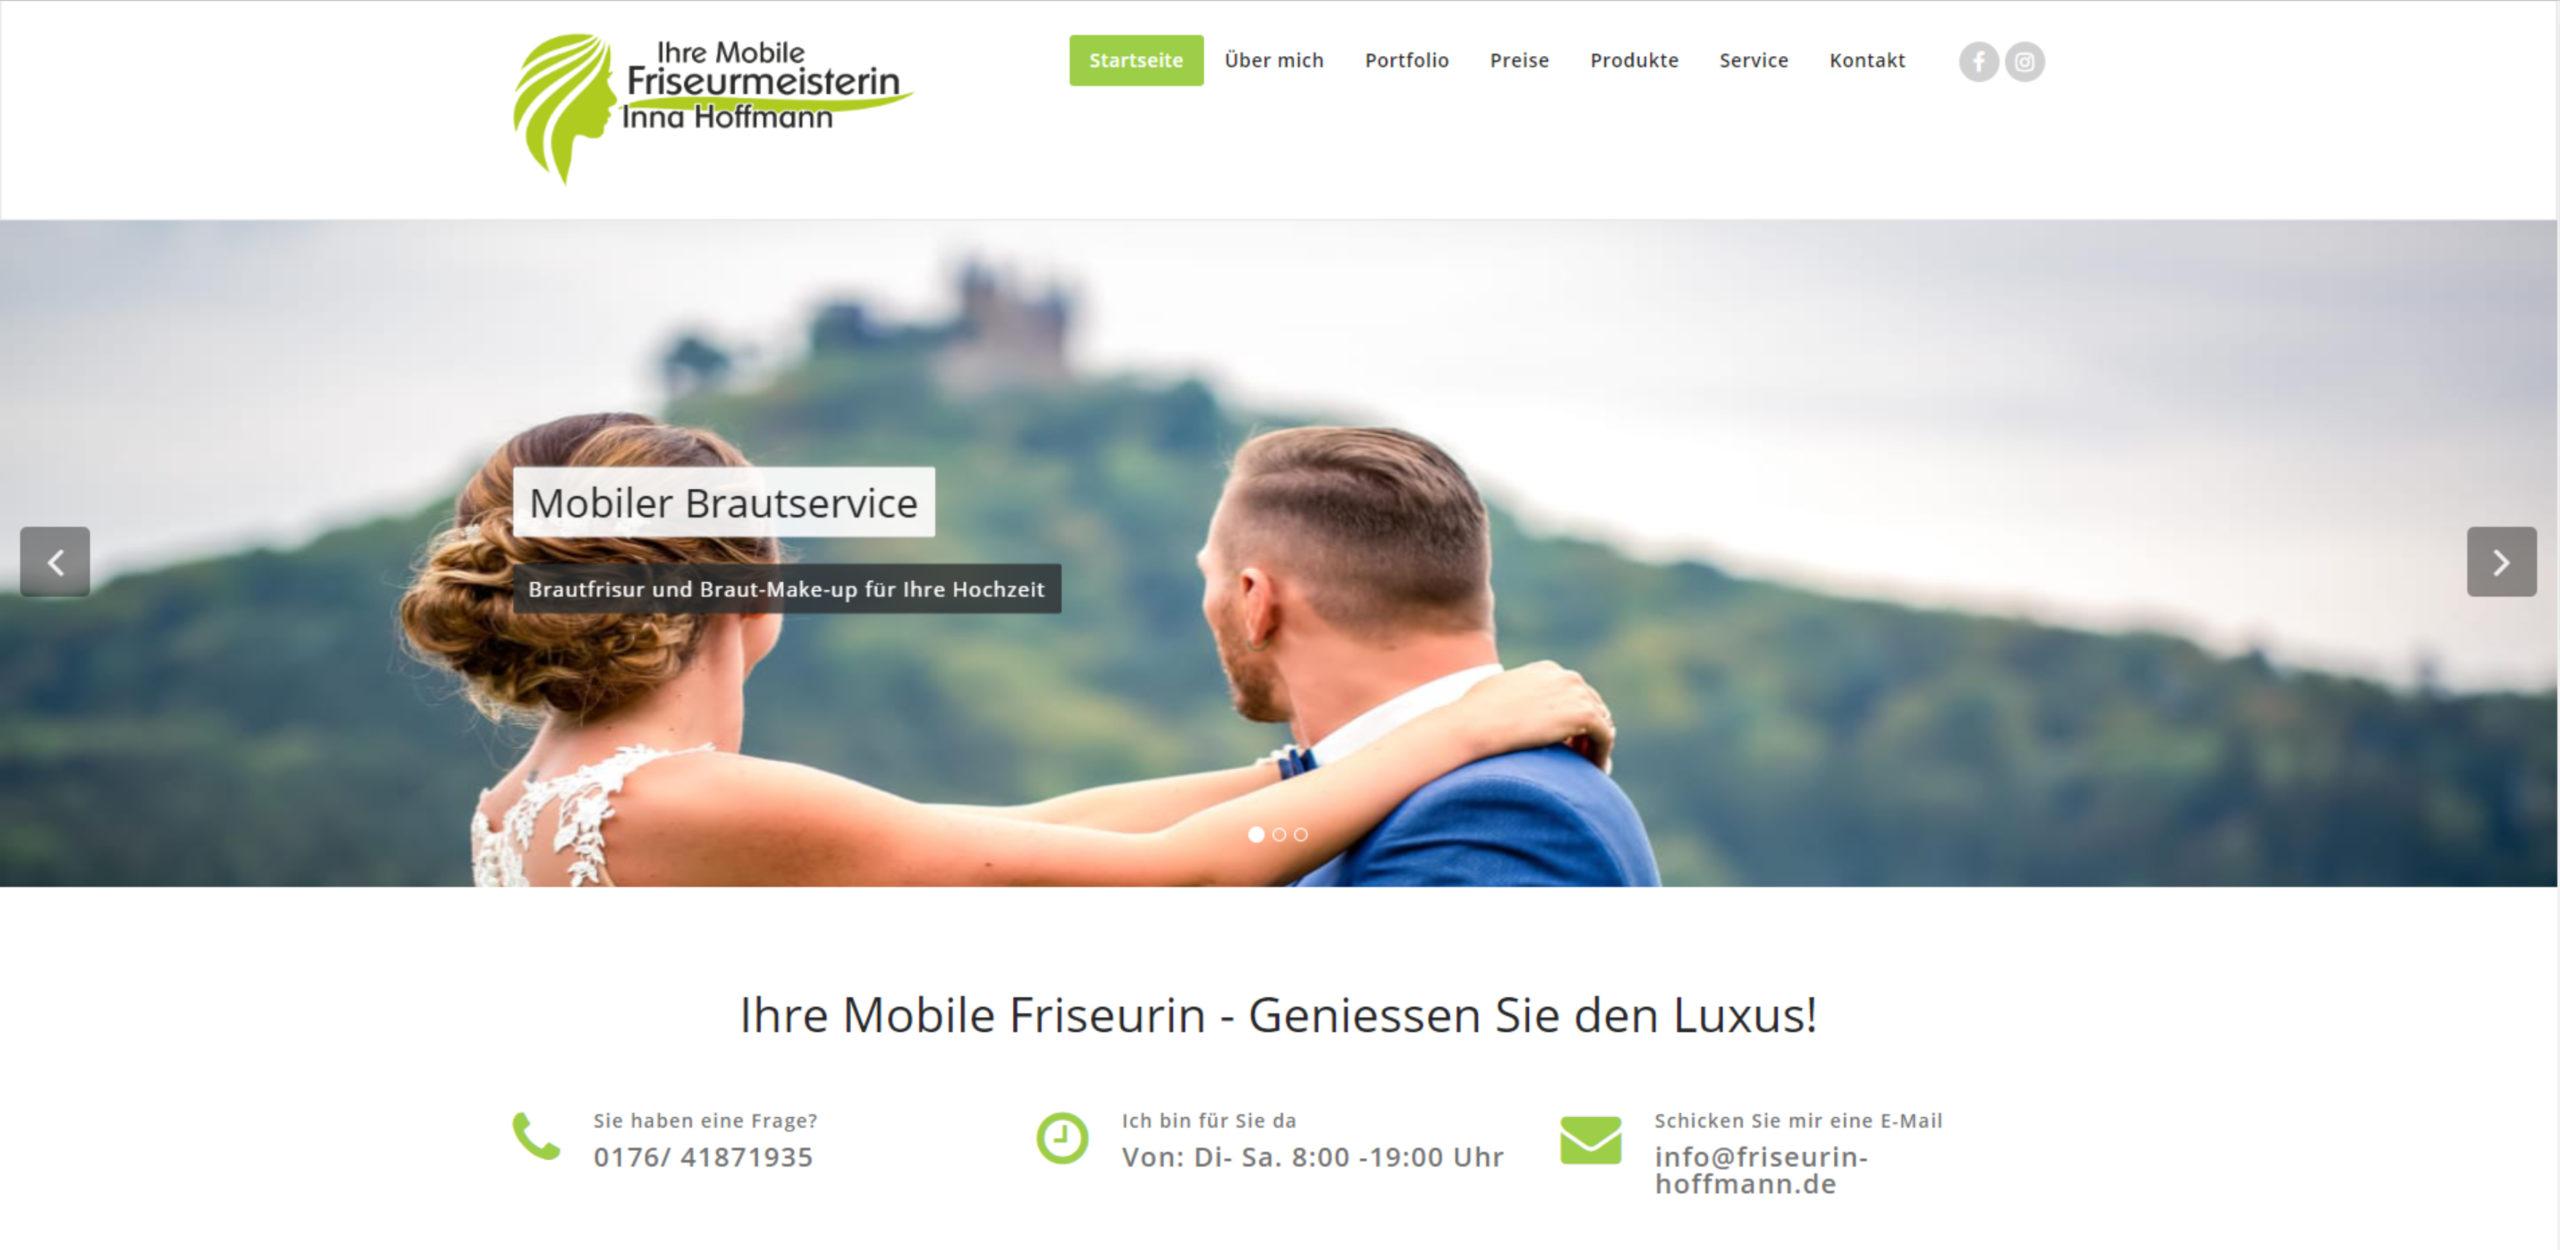 Ihre Mobile Friseurmeisterin - Inna Hoffmann